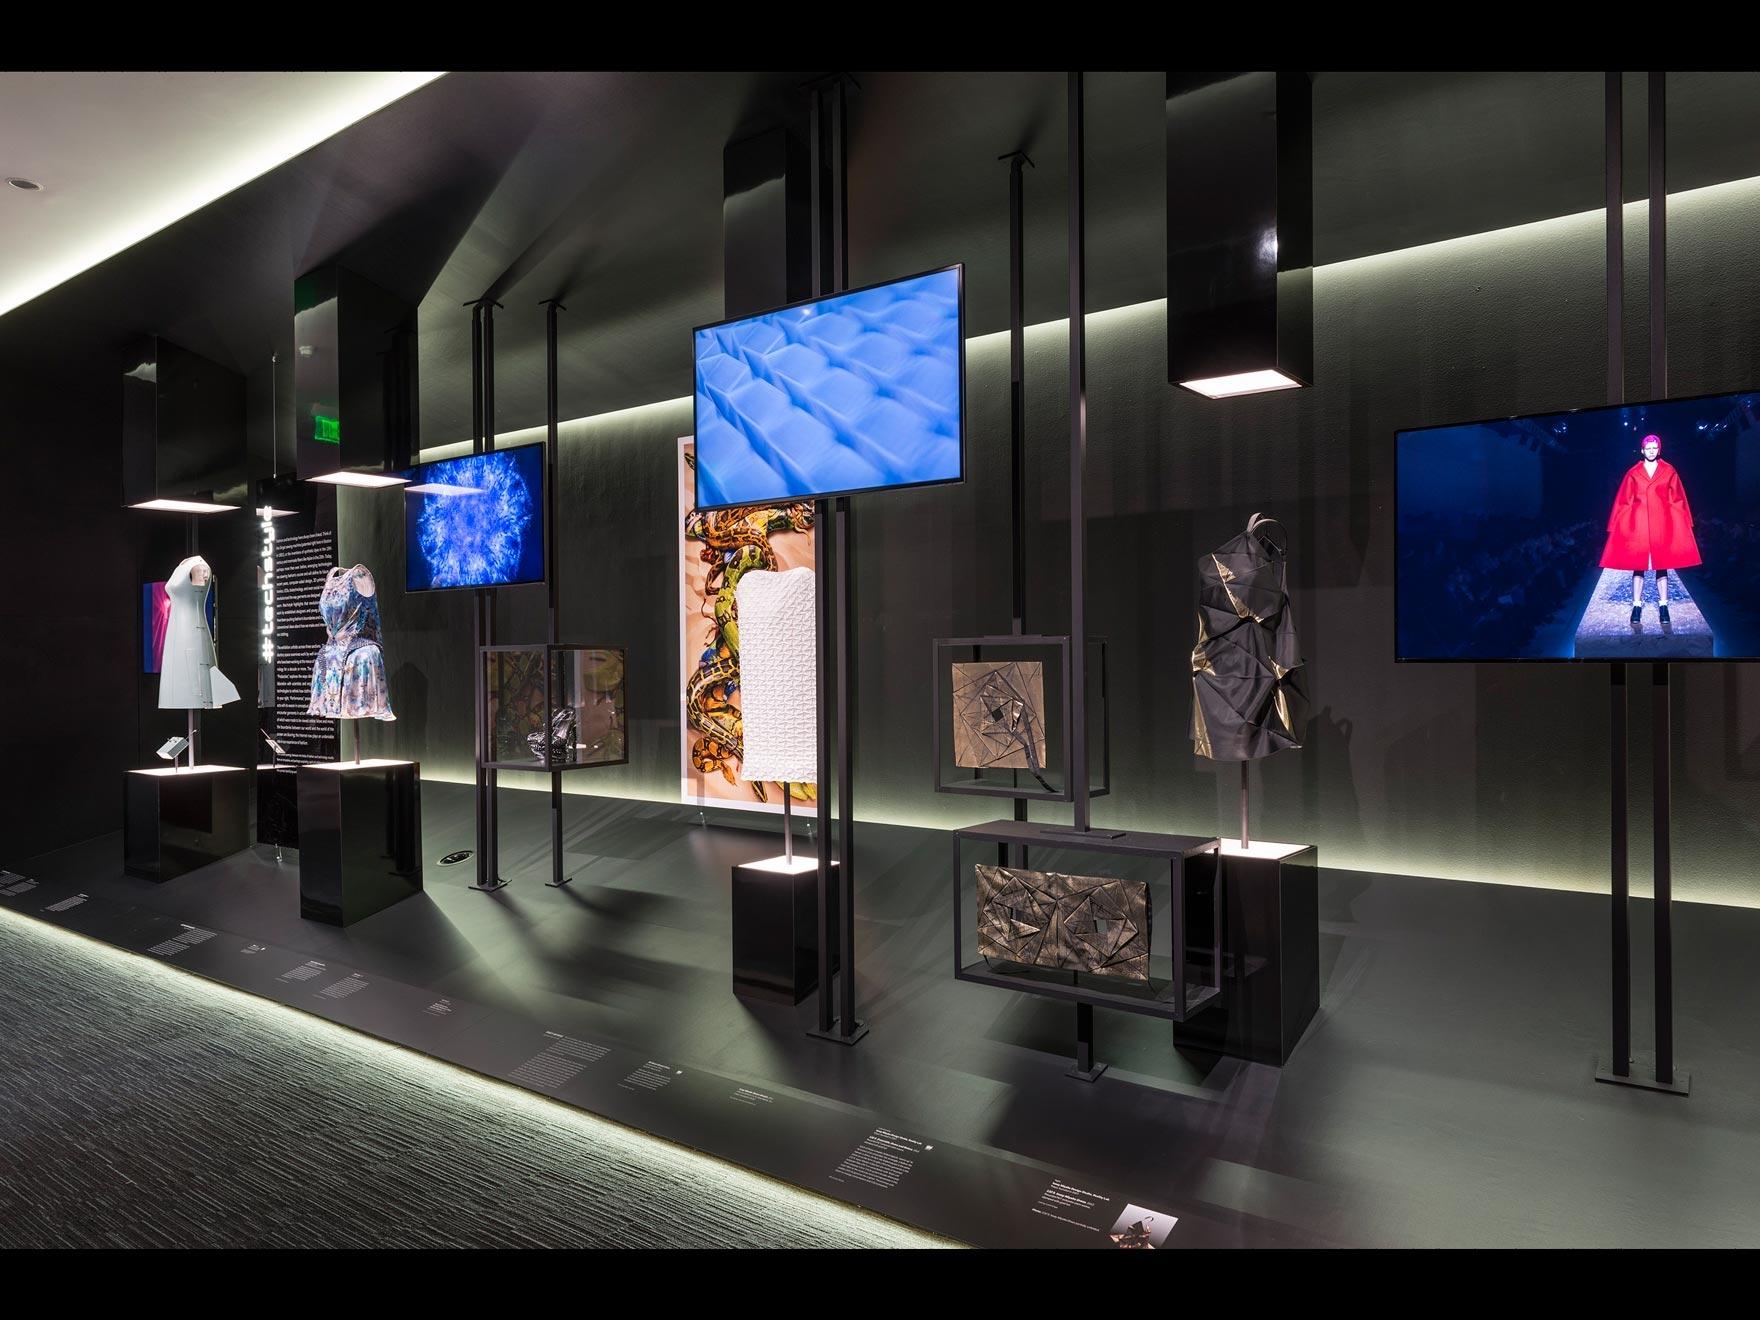 Installation shot of #techstyle exhibition